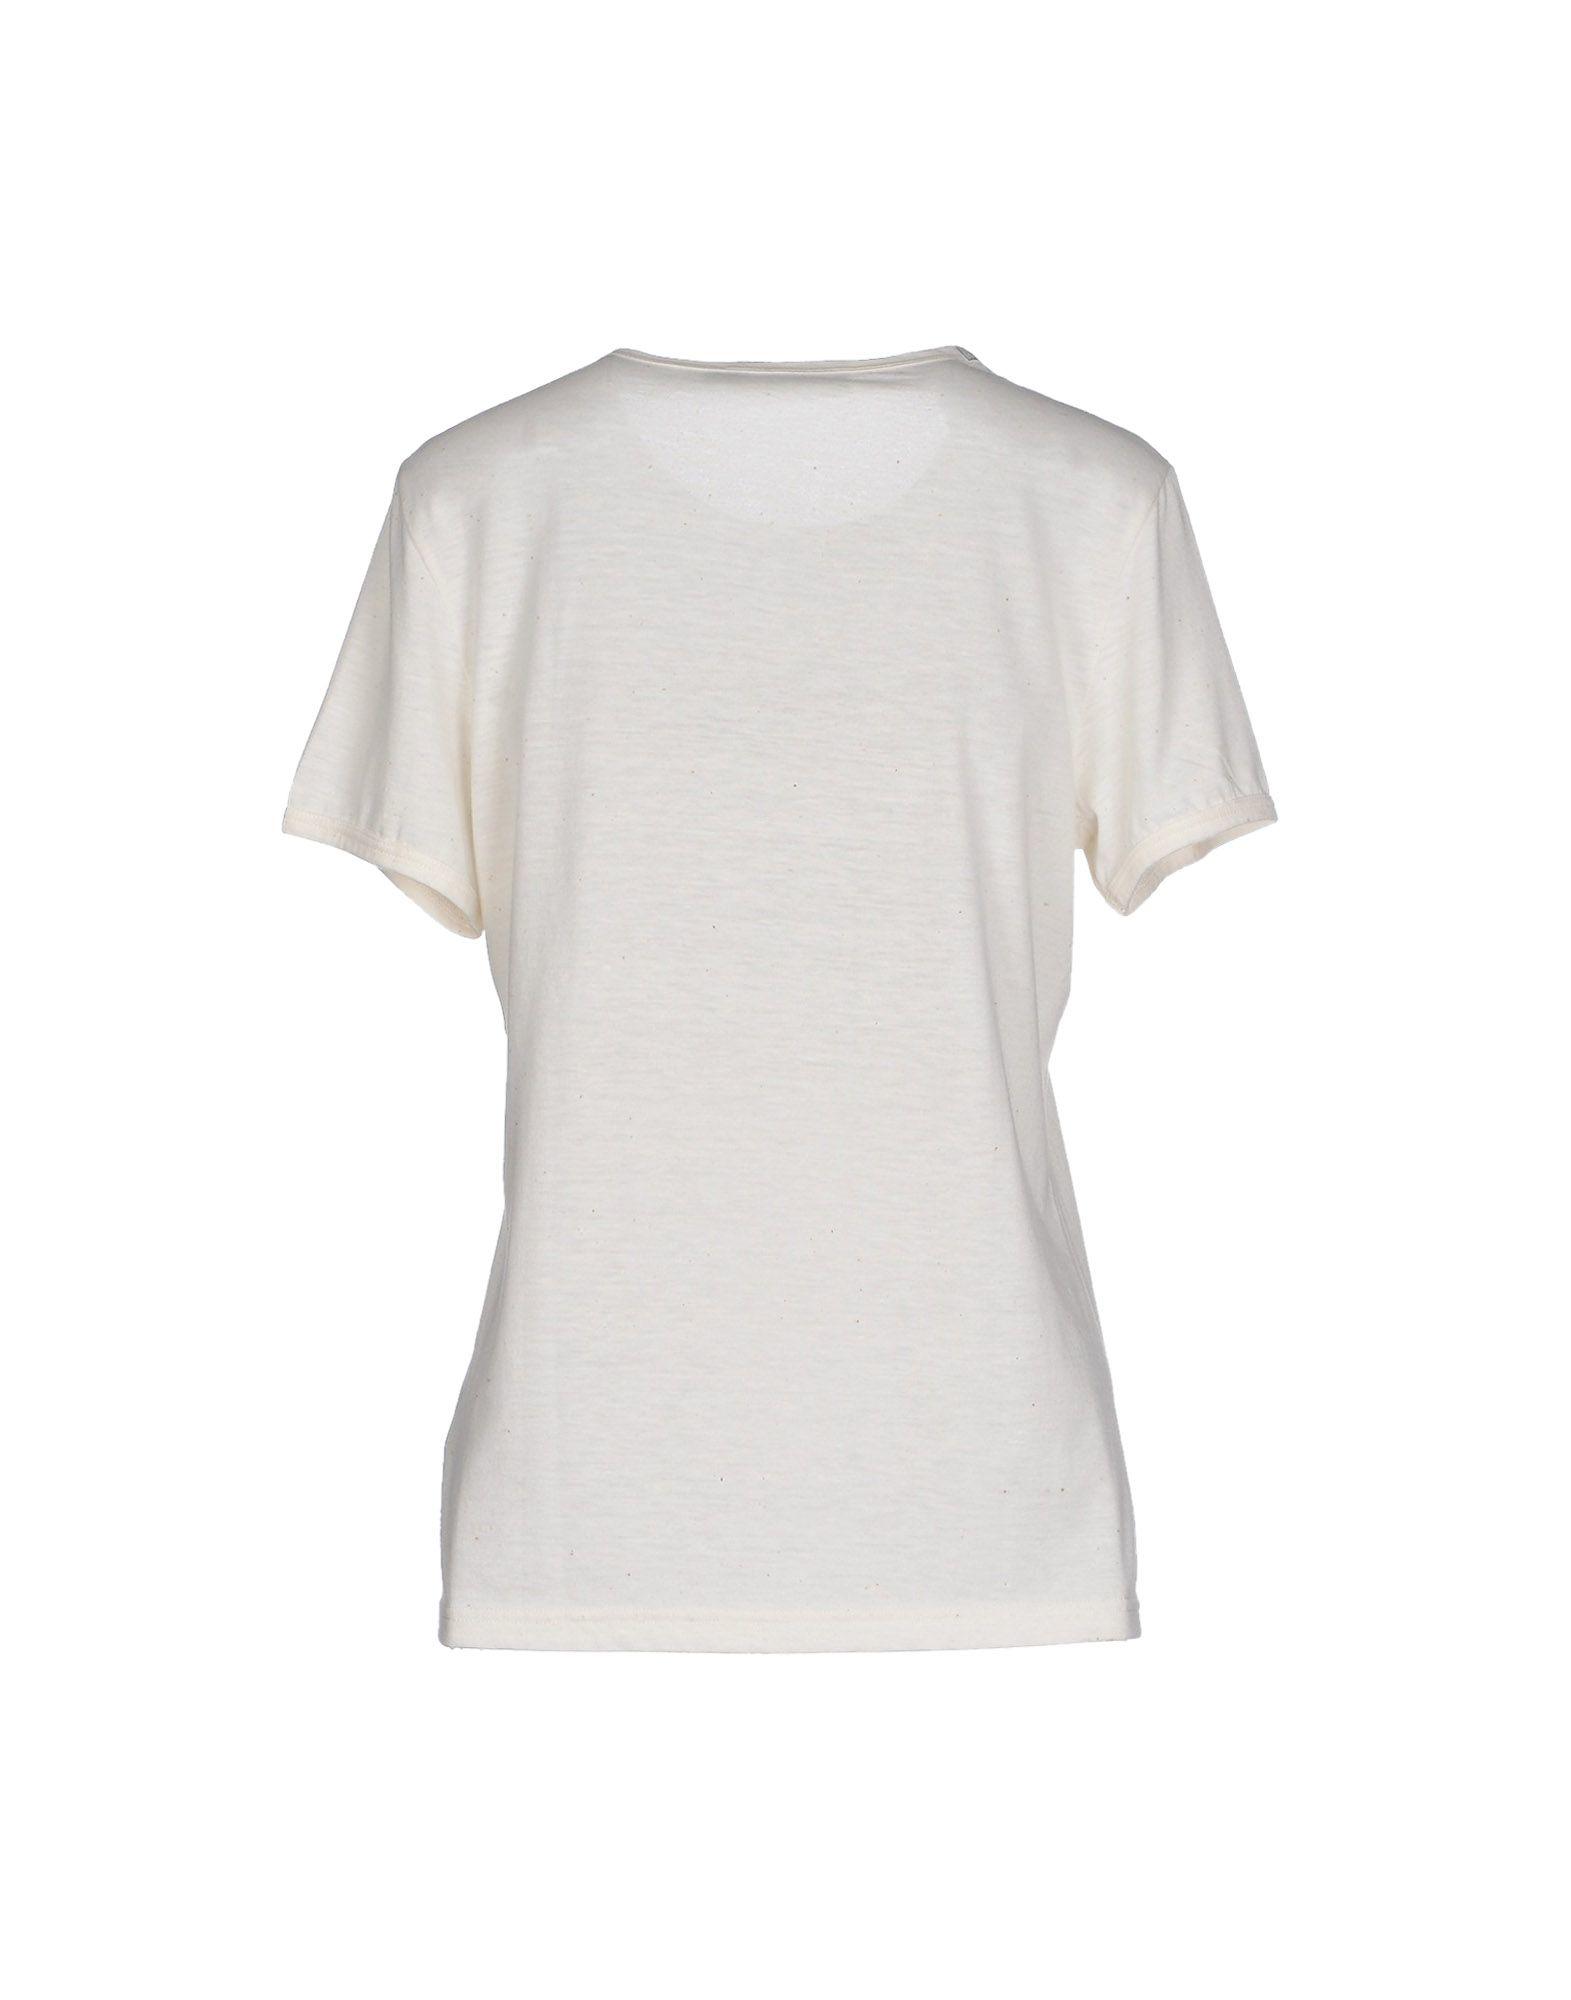 dolce gabbana t shirt in white lyst. Black Bedroom Furniture Sets. Home Design Ideas